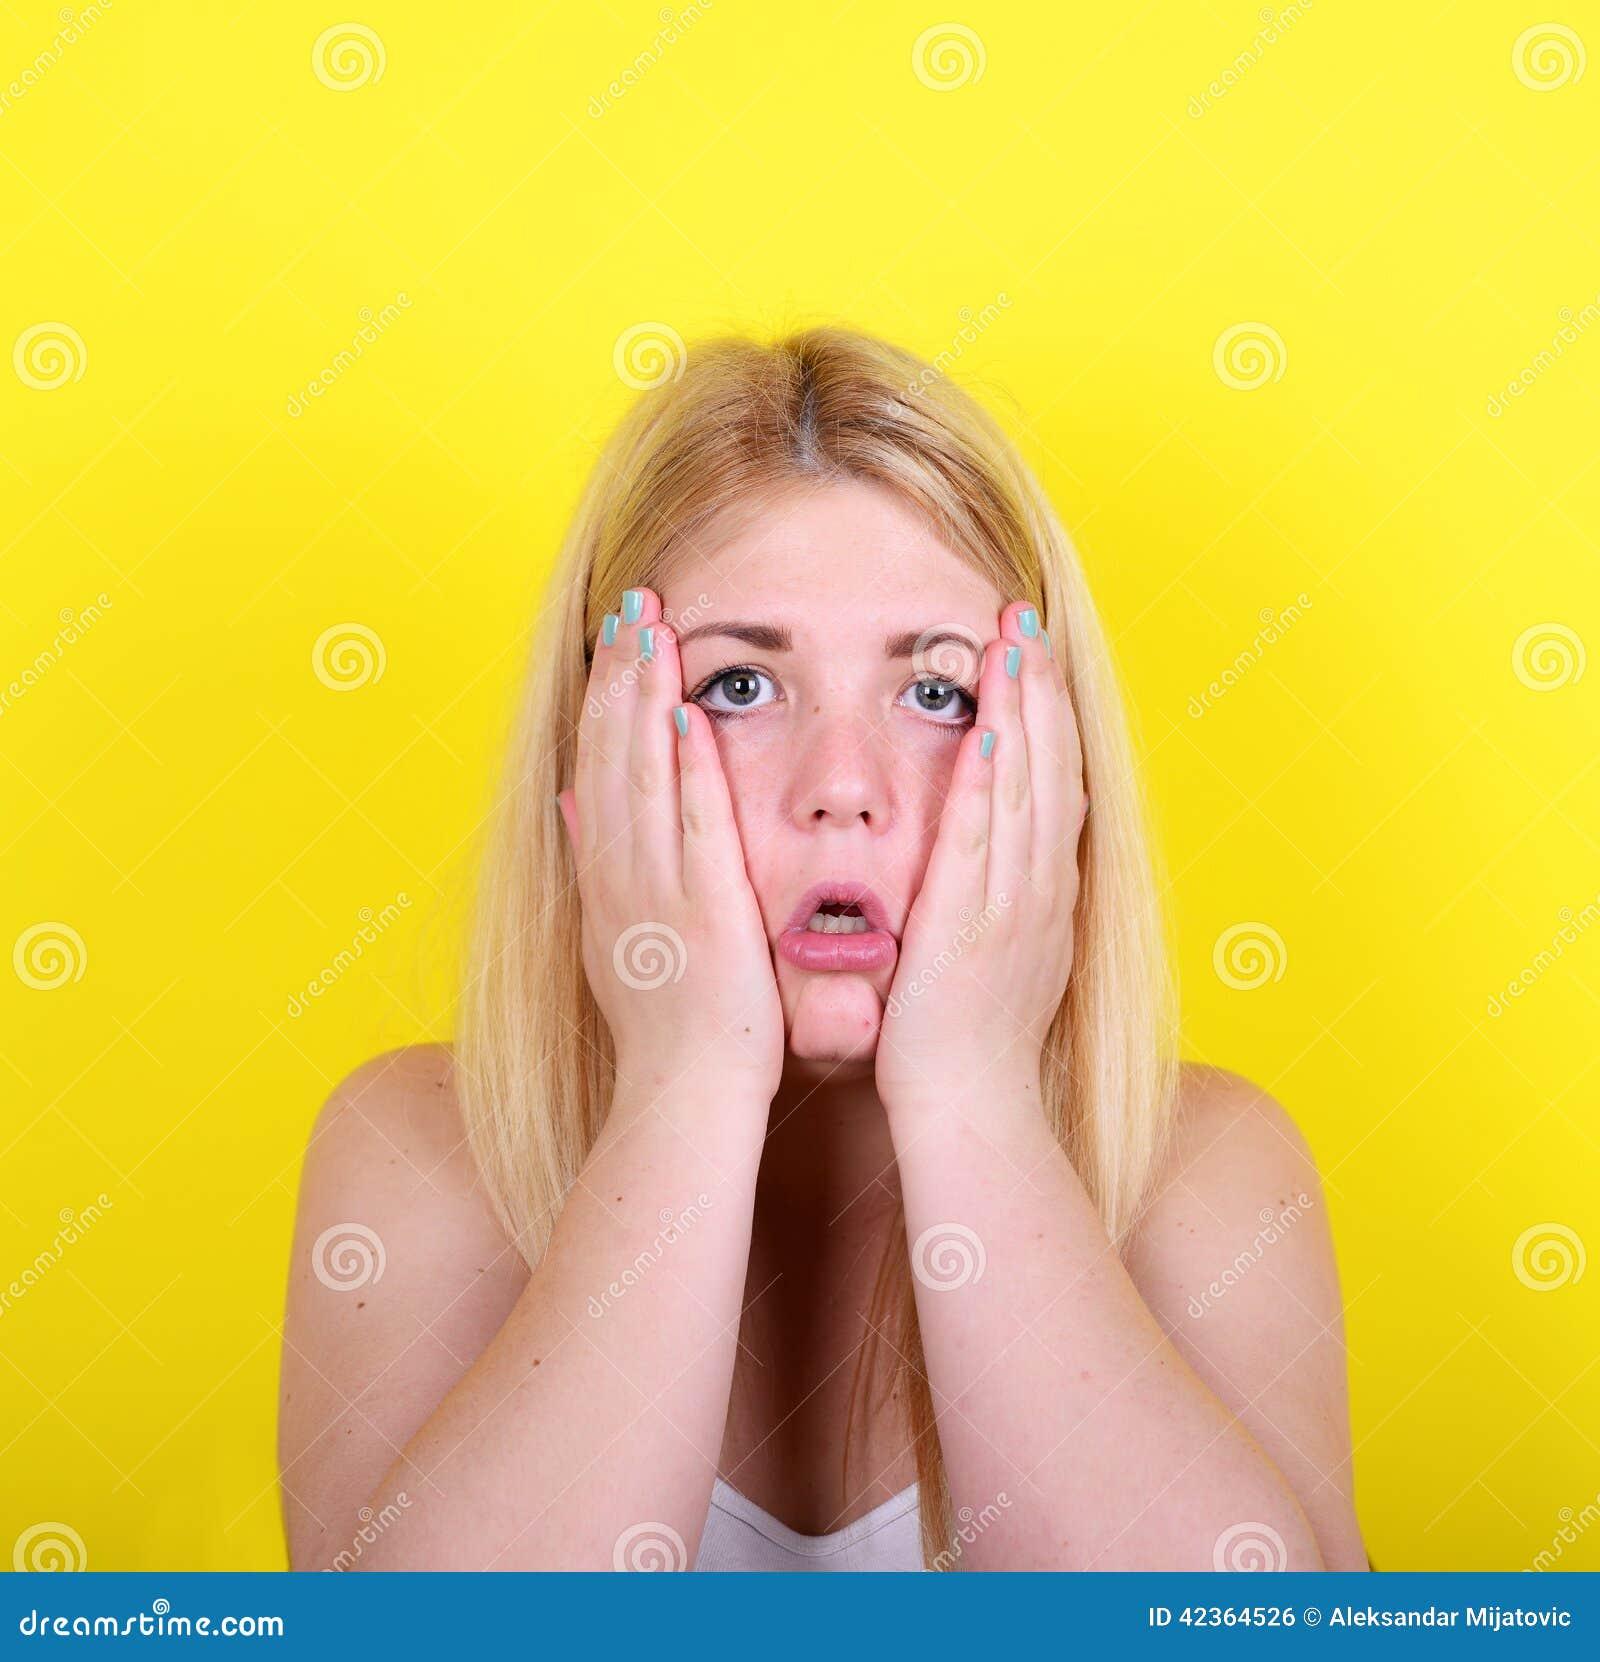 Retrato da menina surpreendida contra o fundo amarelo